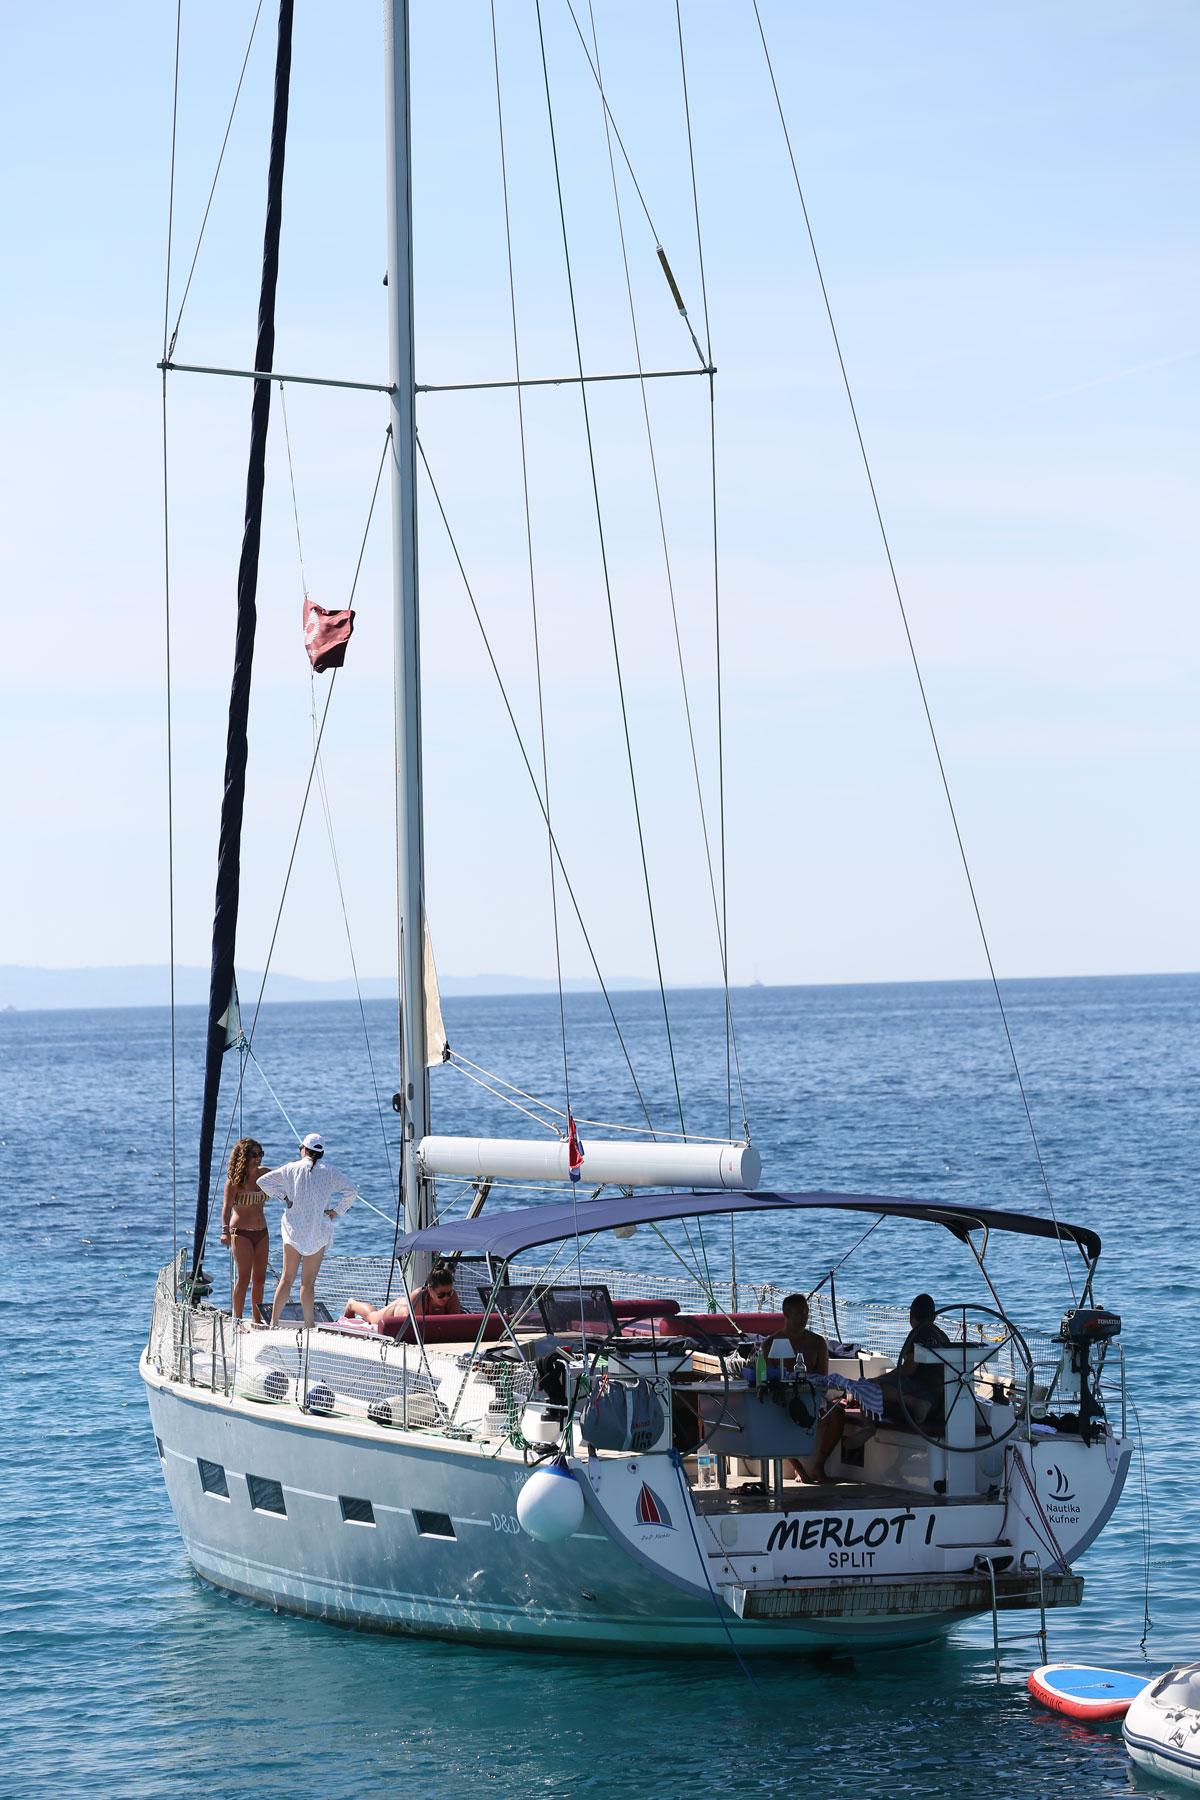 Sailing-yacht-with-Wind-_-Wine-Croatia_D